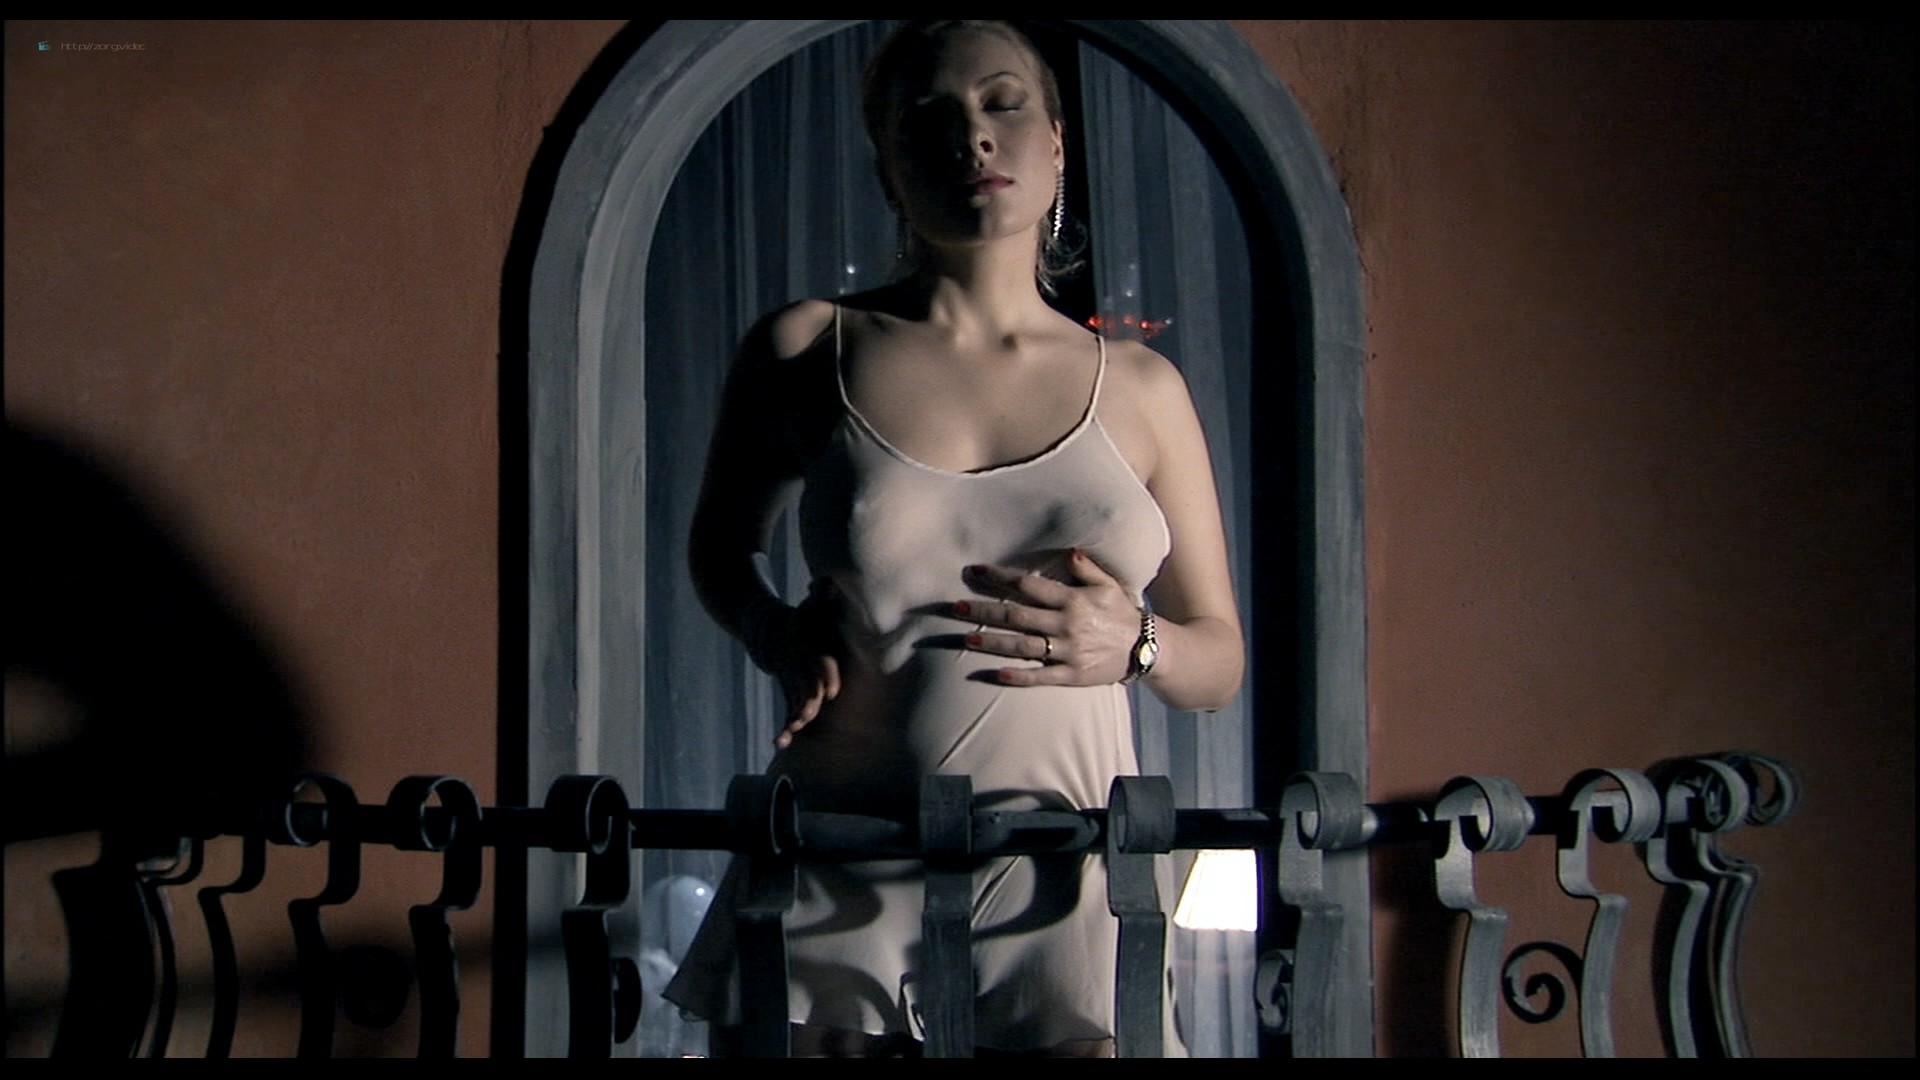 Anna Jimskaia nude explicit Nela Lucic nude - Monamour (2006) HD 1080p BluRay (r) (14)